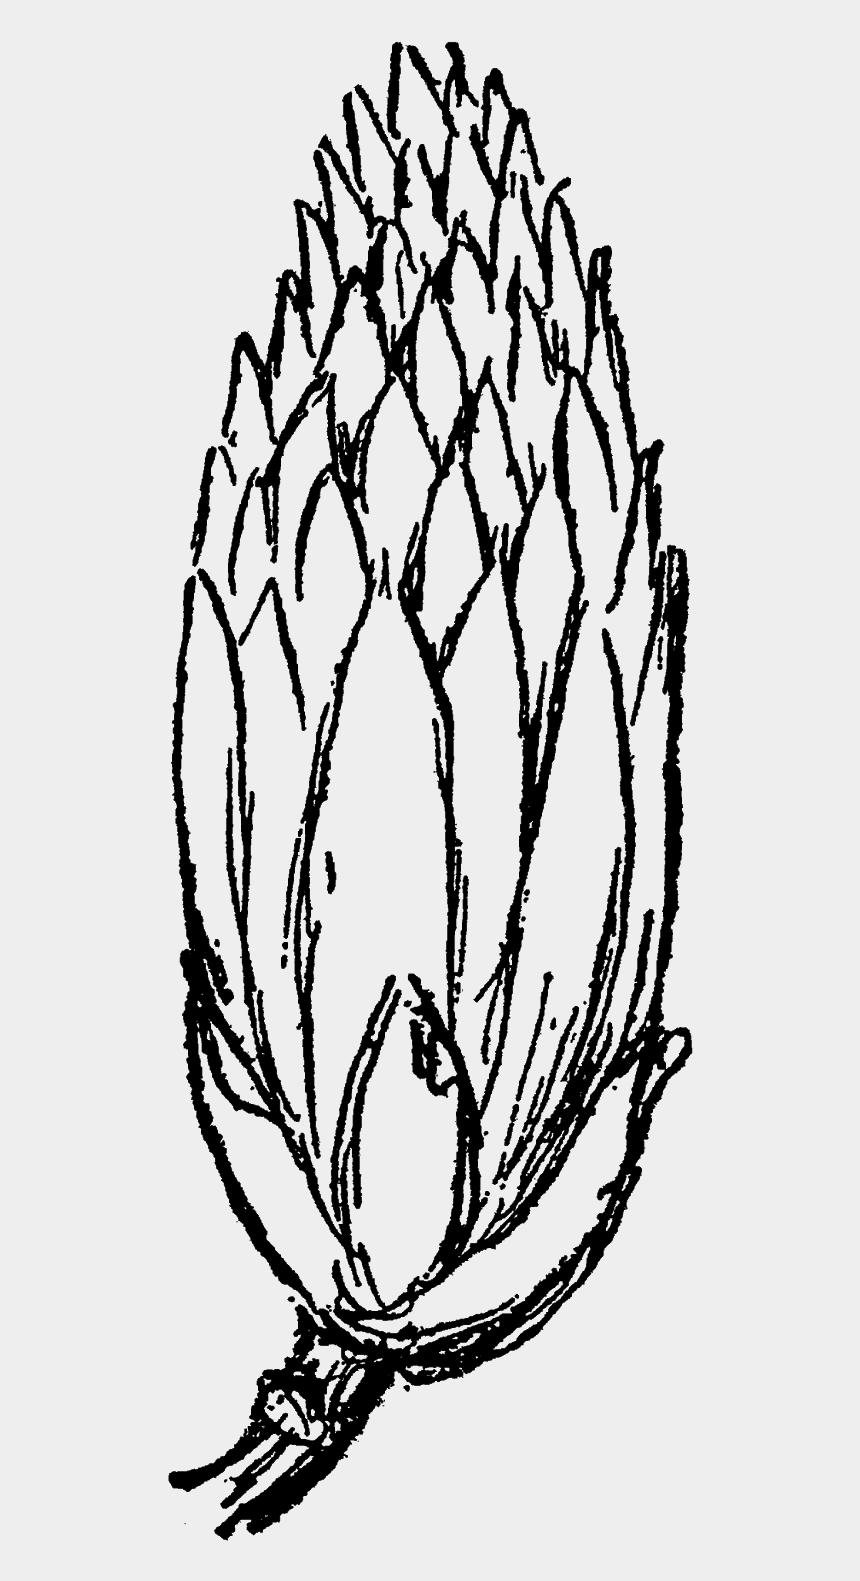 flower drawing clipart, Cartoons - Flower Floral Wildflower Tulip Tree Blossom Digital - Sketch